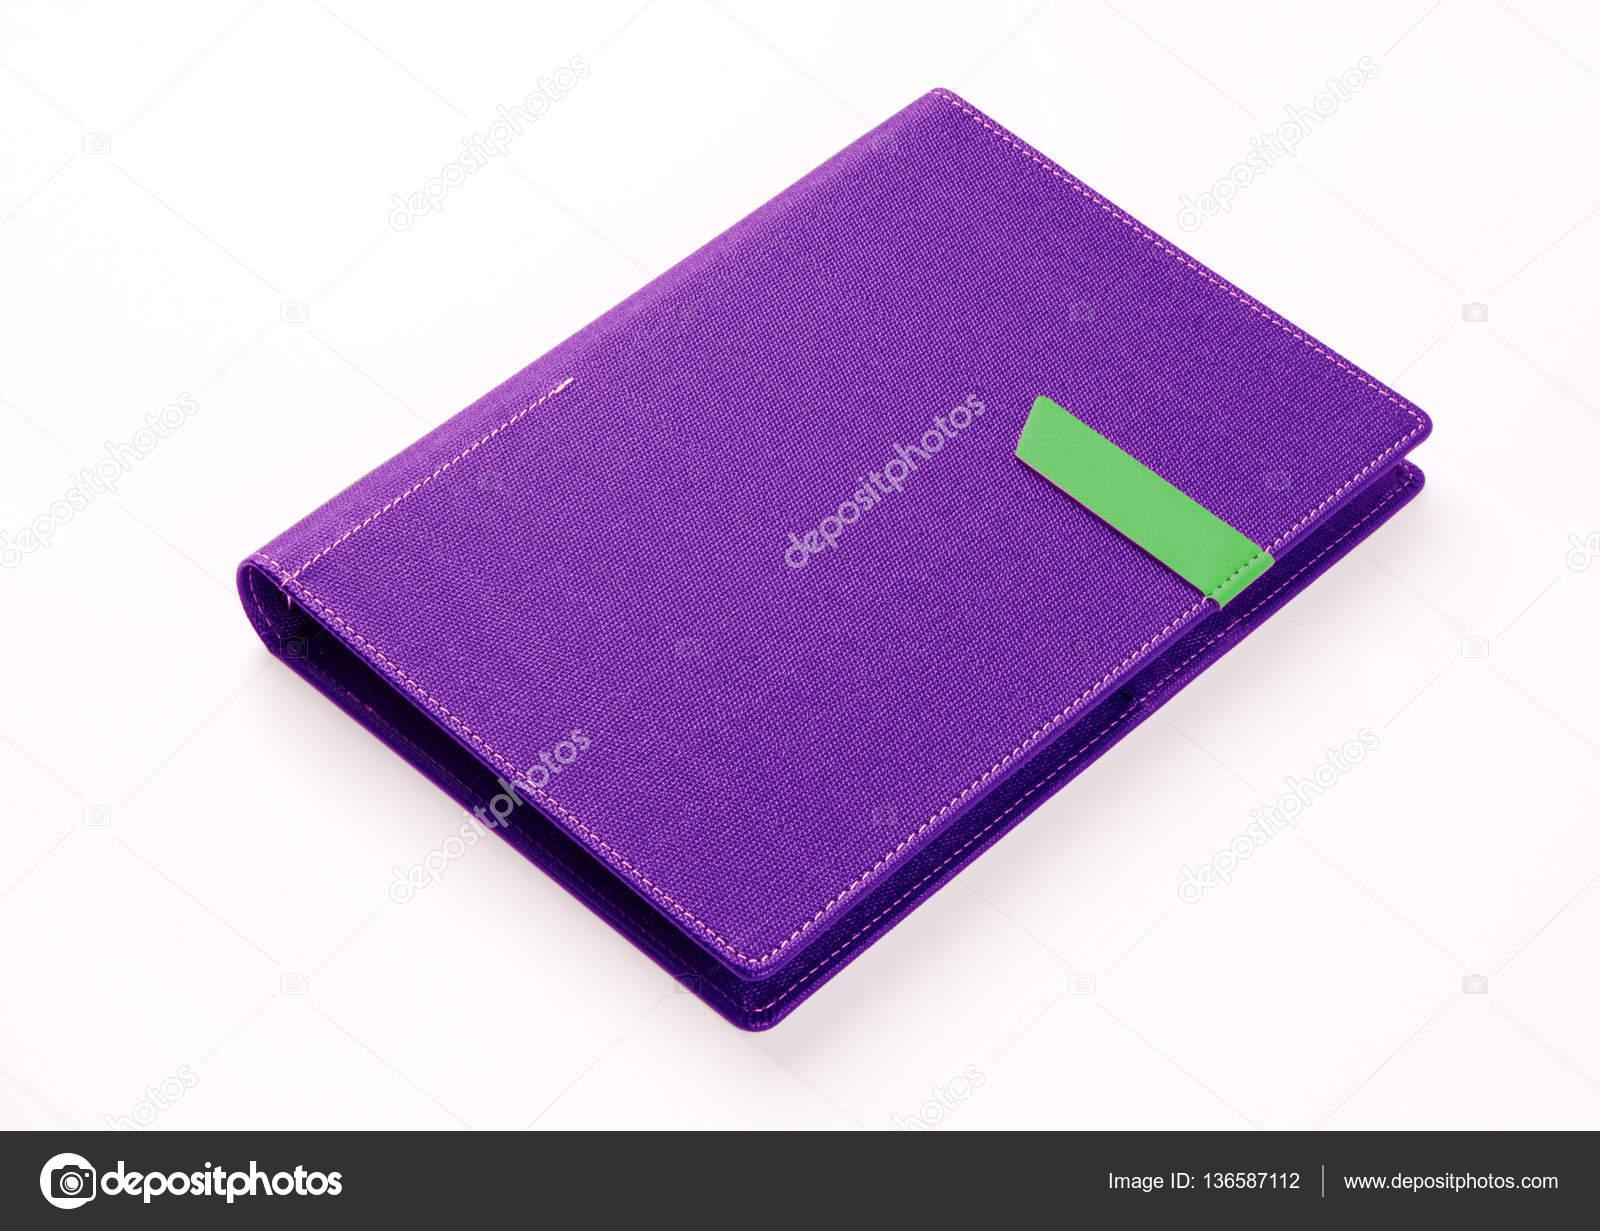 Libro organizador color púrpura sobre fondo blanco — Foto de stock ...